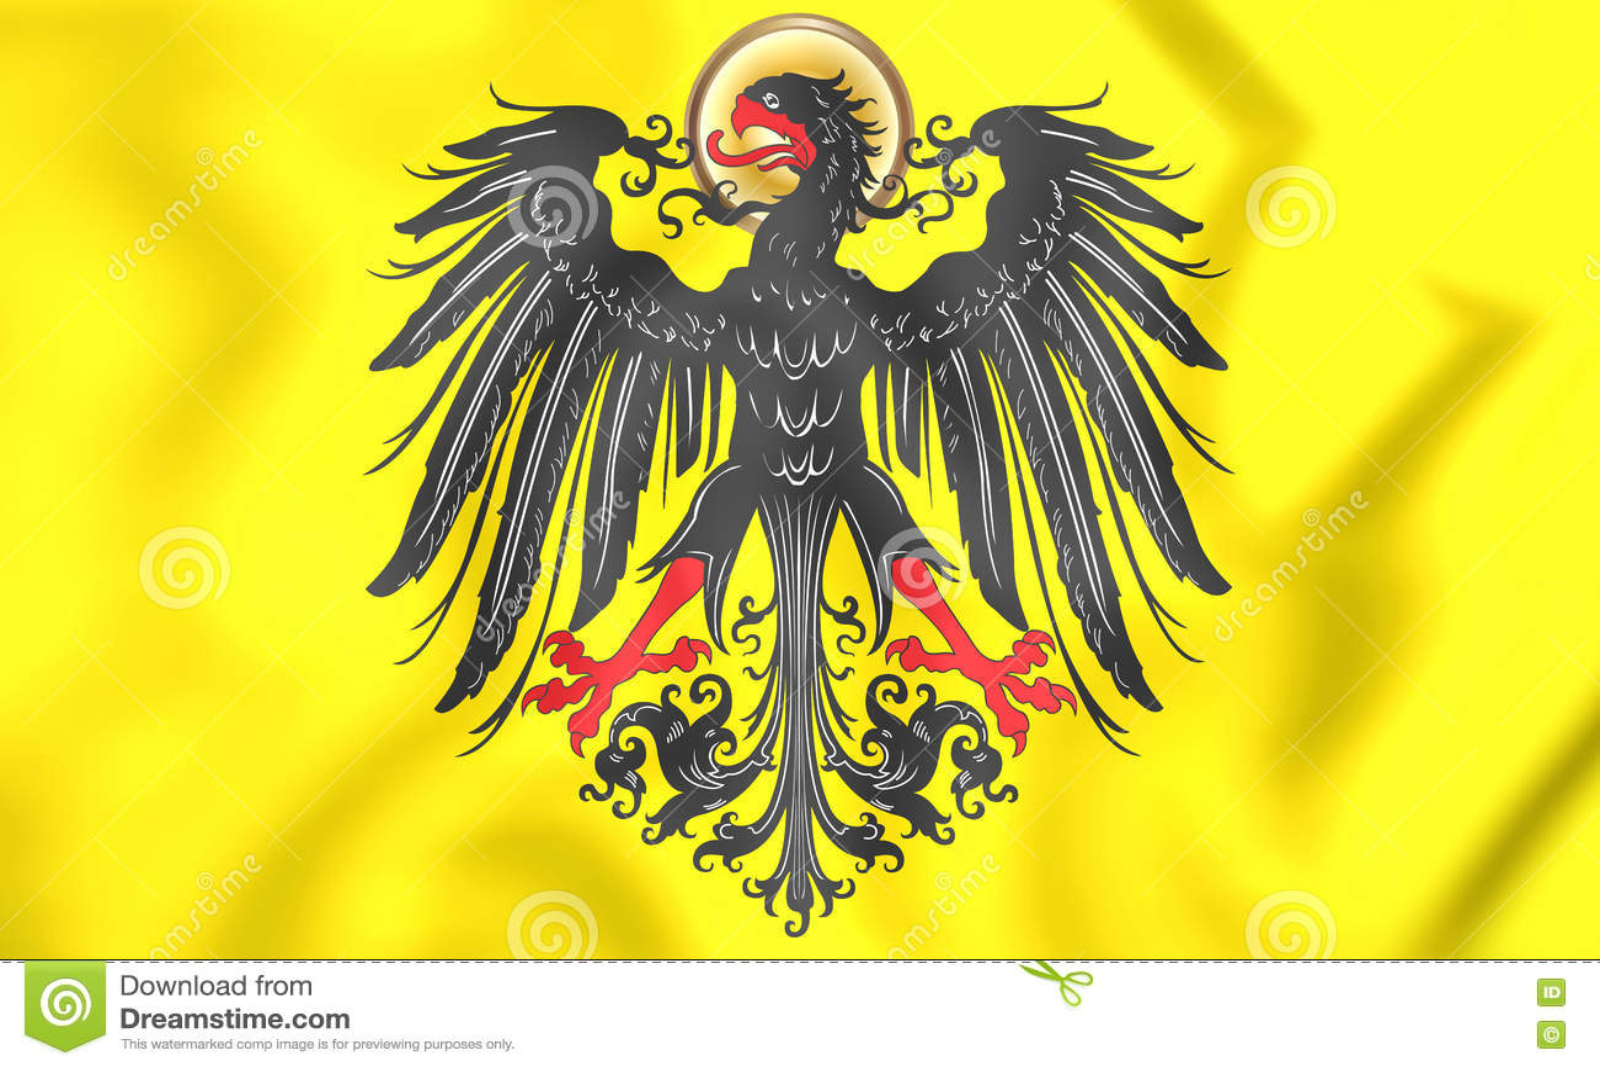 Bandeira imperial de Roman Emperor santamente antes de 1433